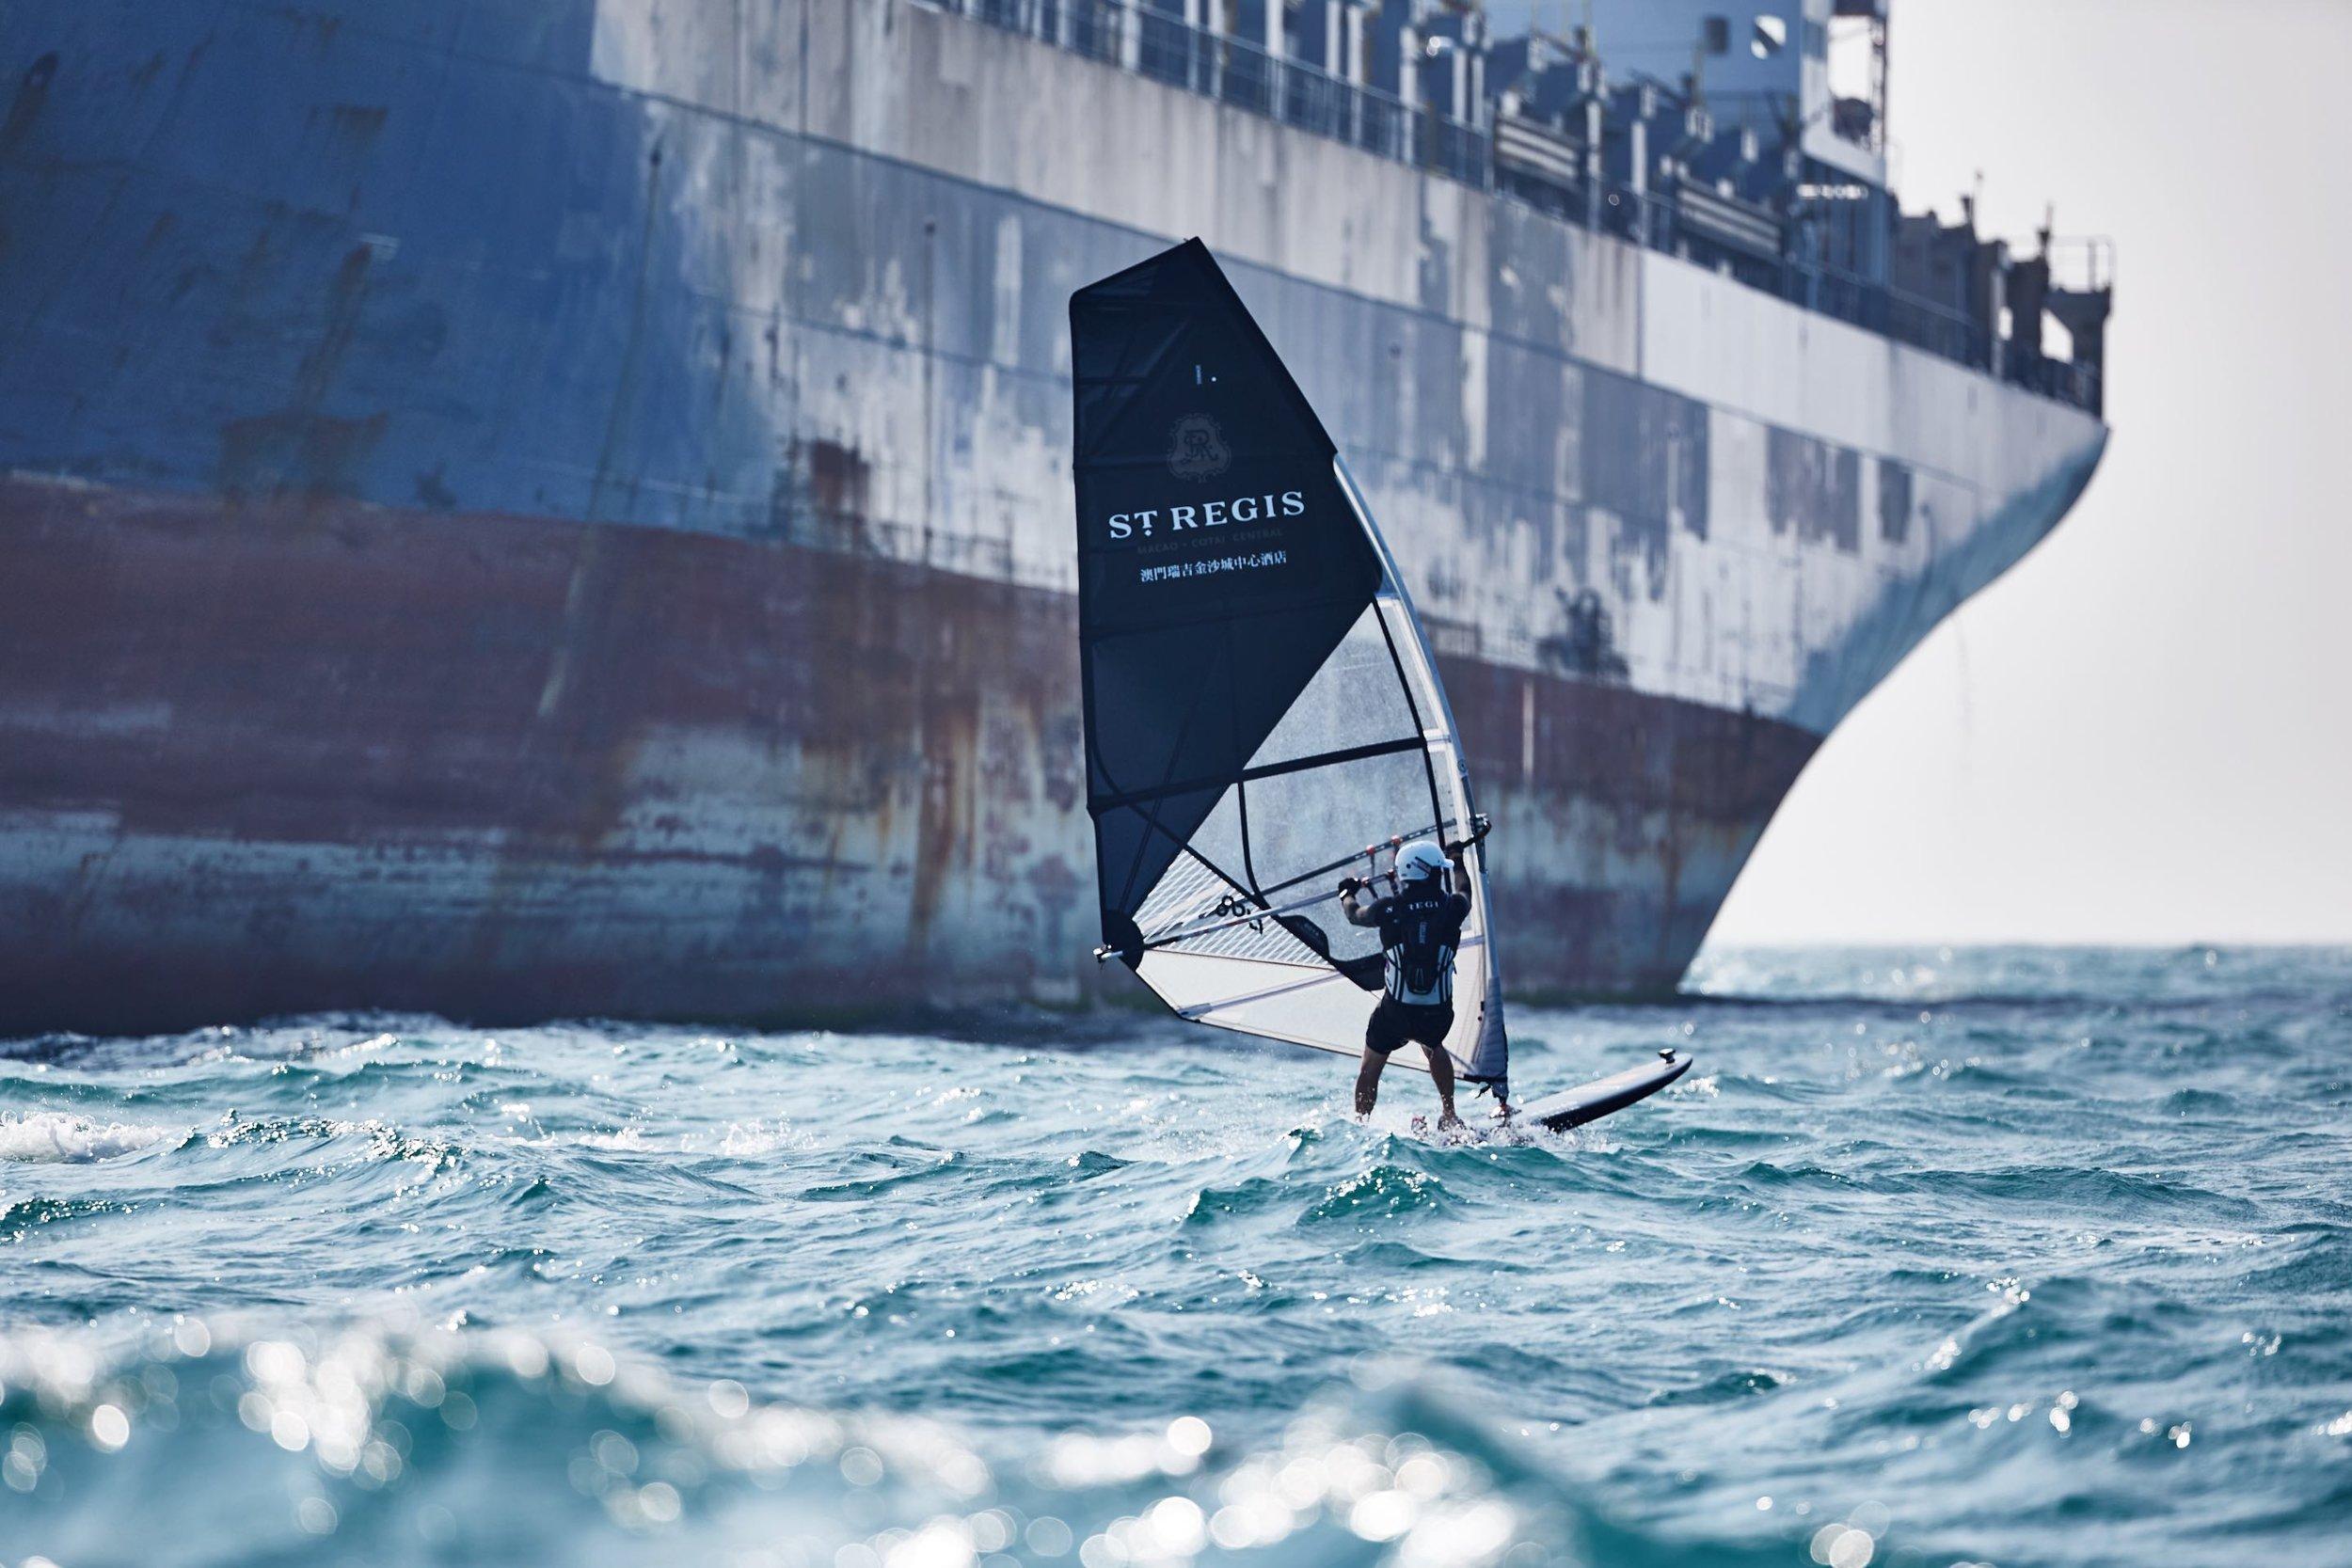 Nick Moloney Wind Surfing